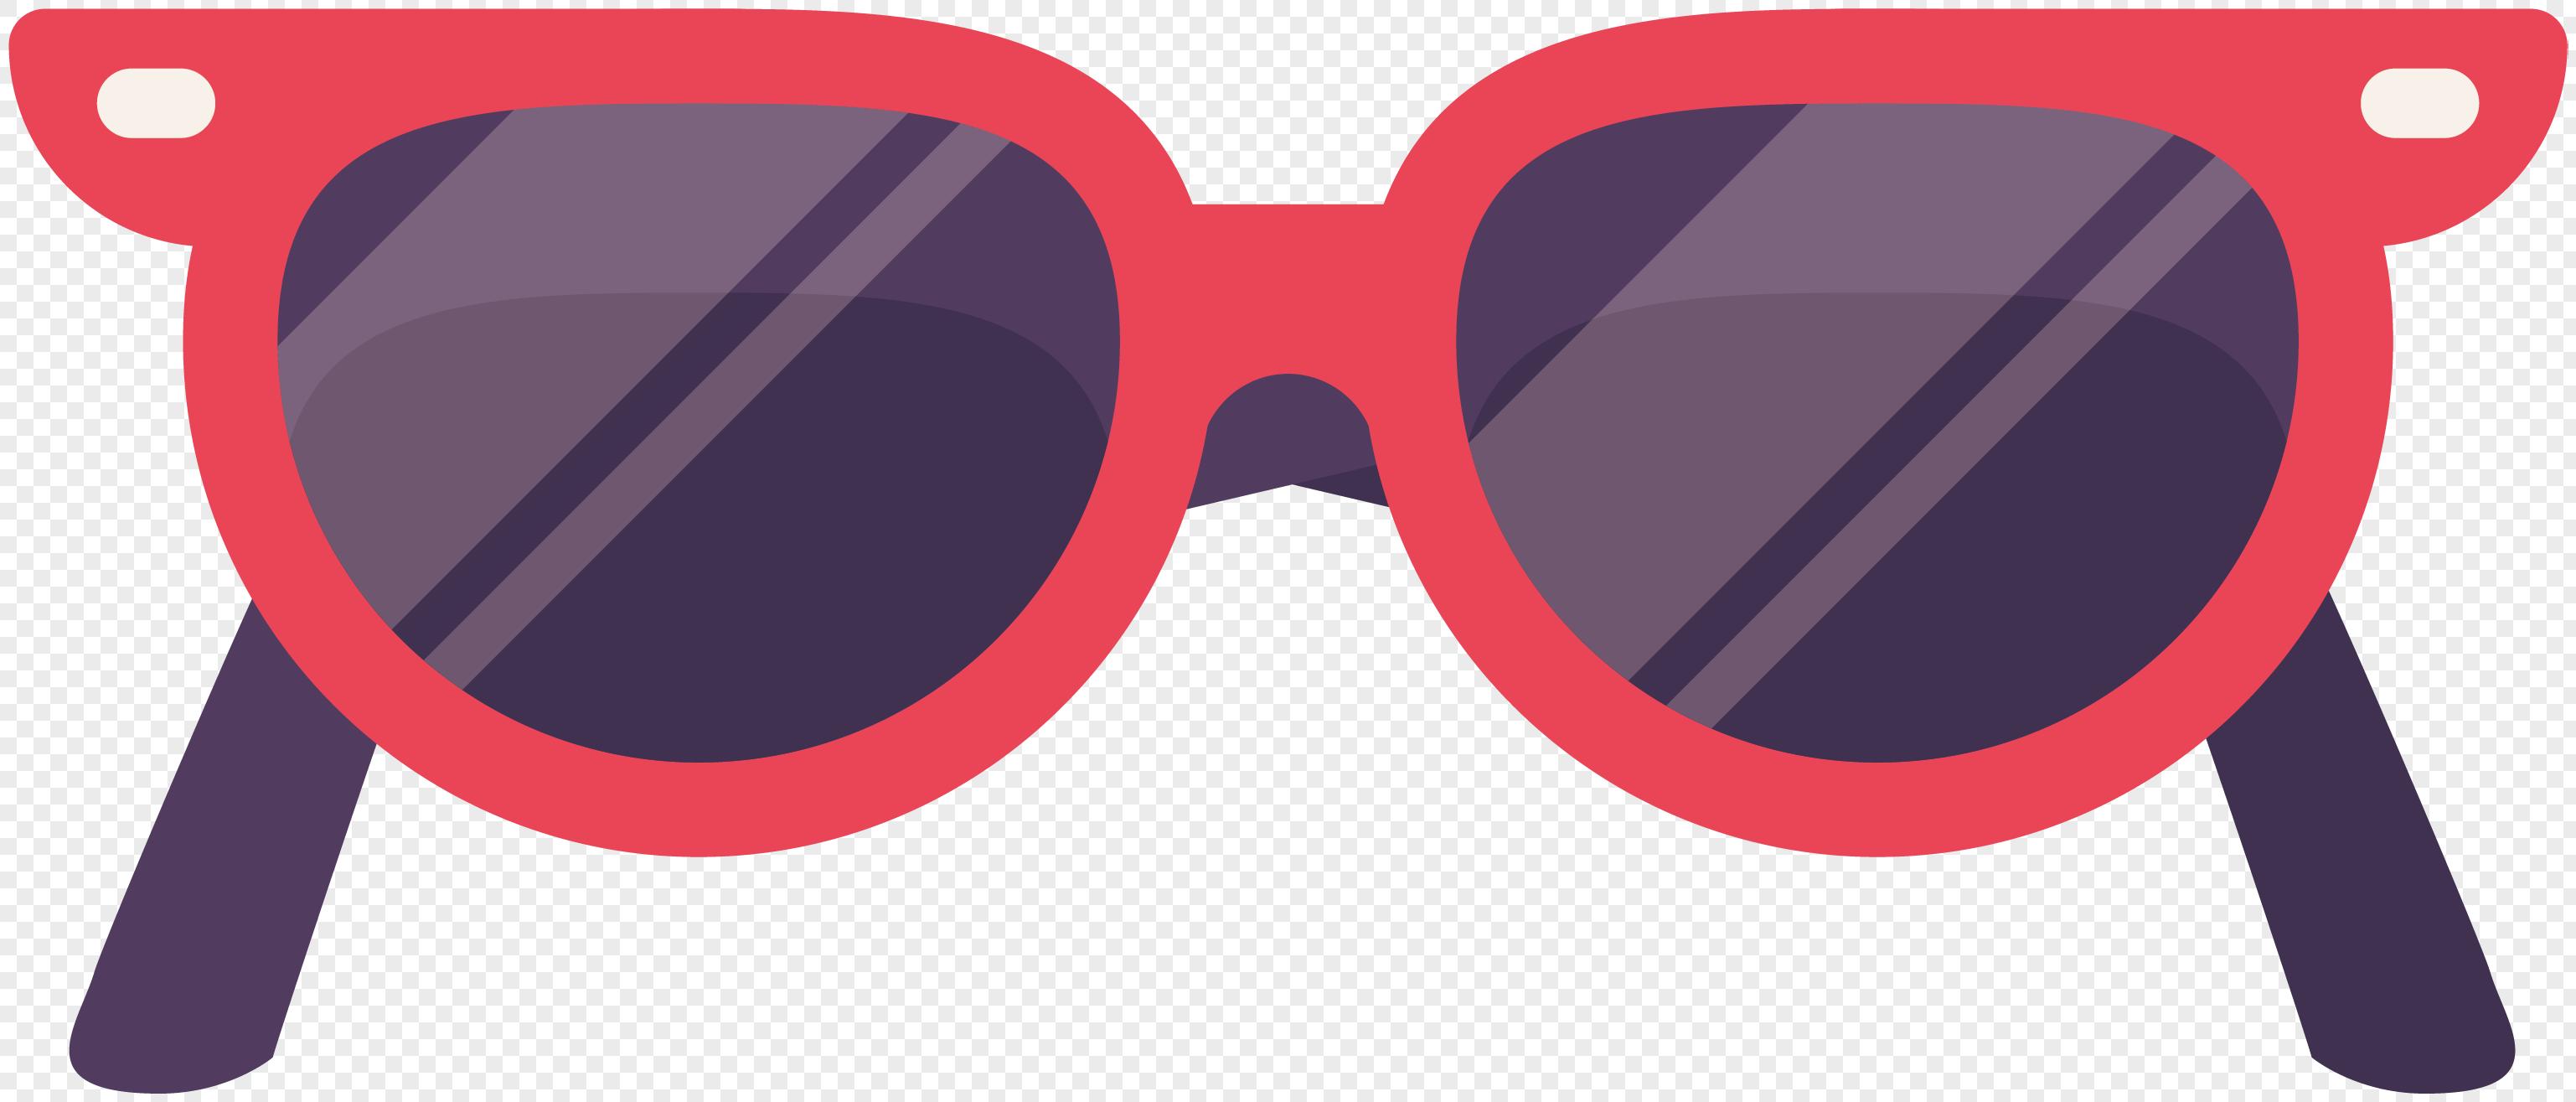 3075x1315 Cool Summer Beach Beach Sunglasses Vector Material Png